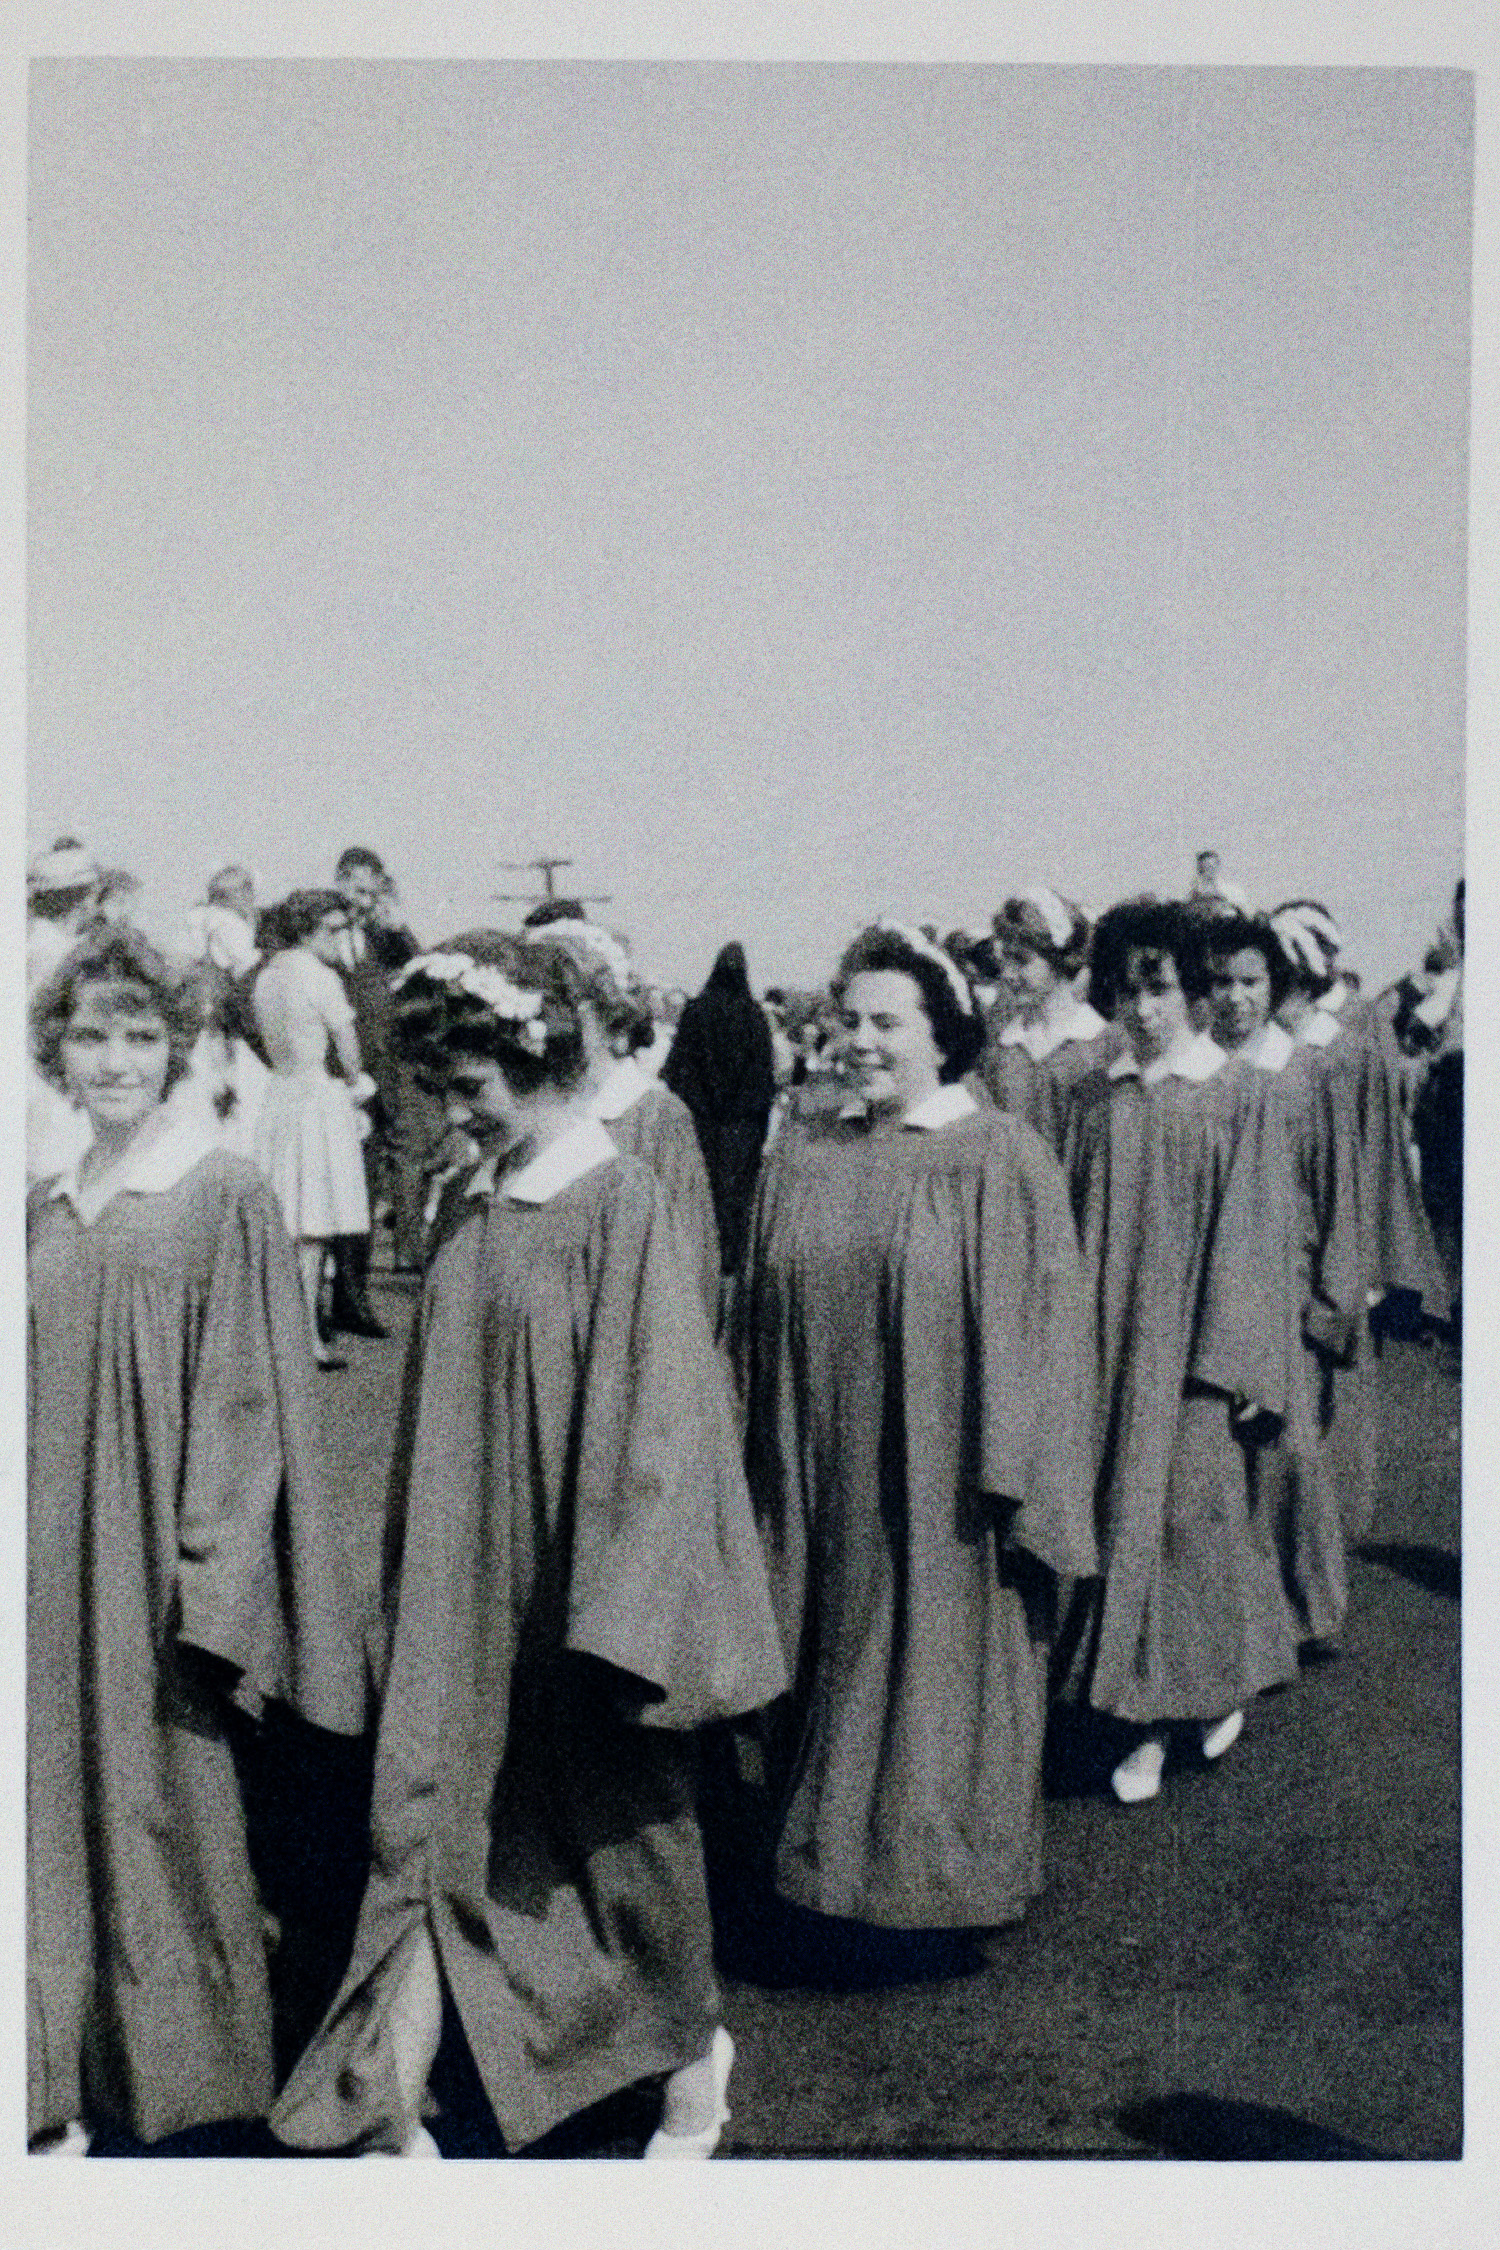 Bridget Mary Meehangraduation marchfrom St. Thomas More CathedralCatholic School in Arlington, VA.(from her photo album)